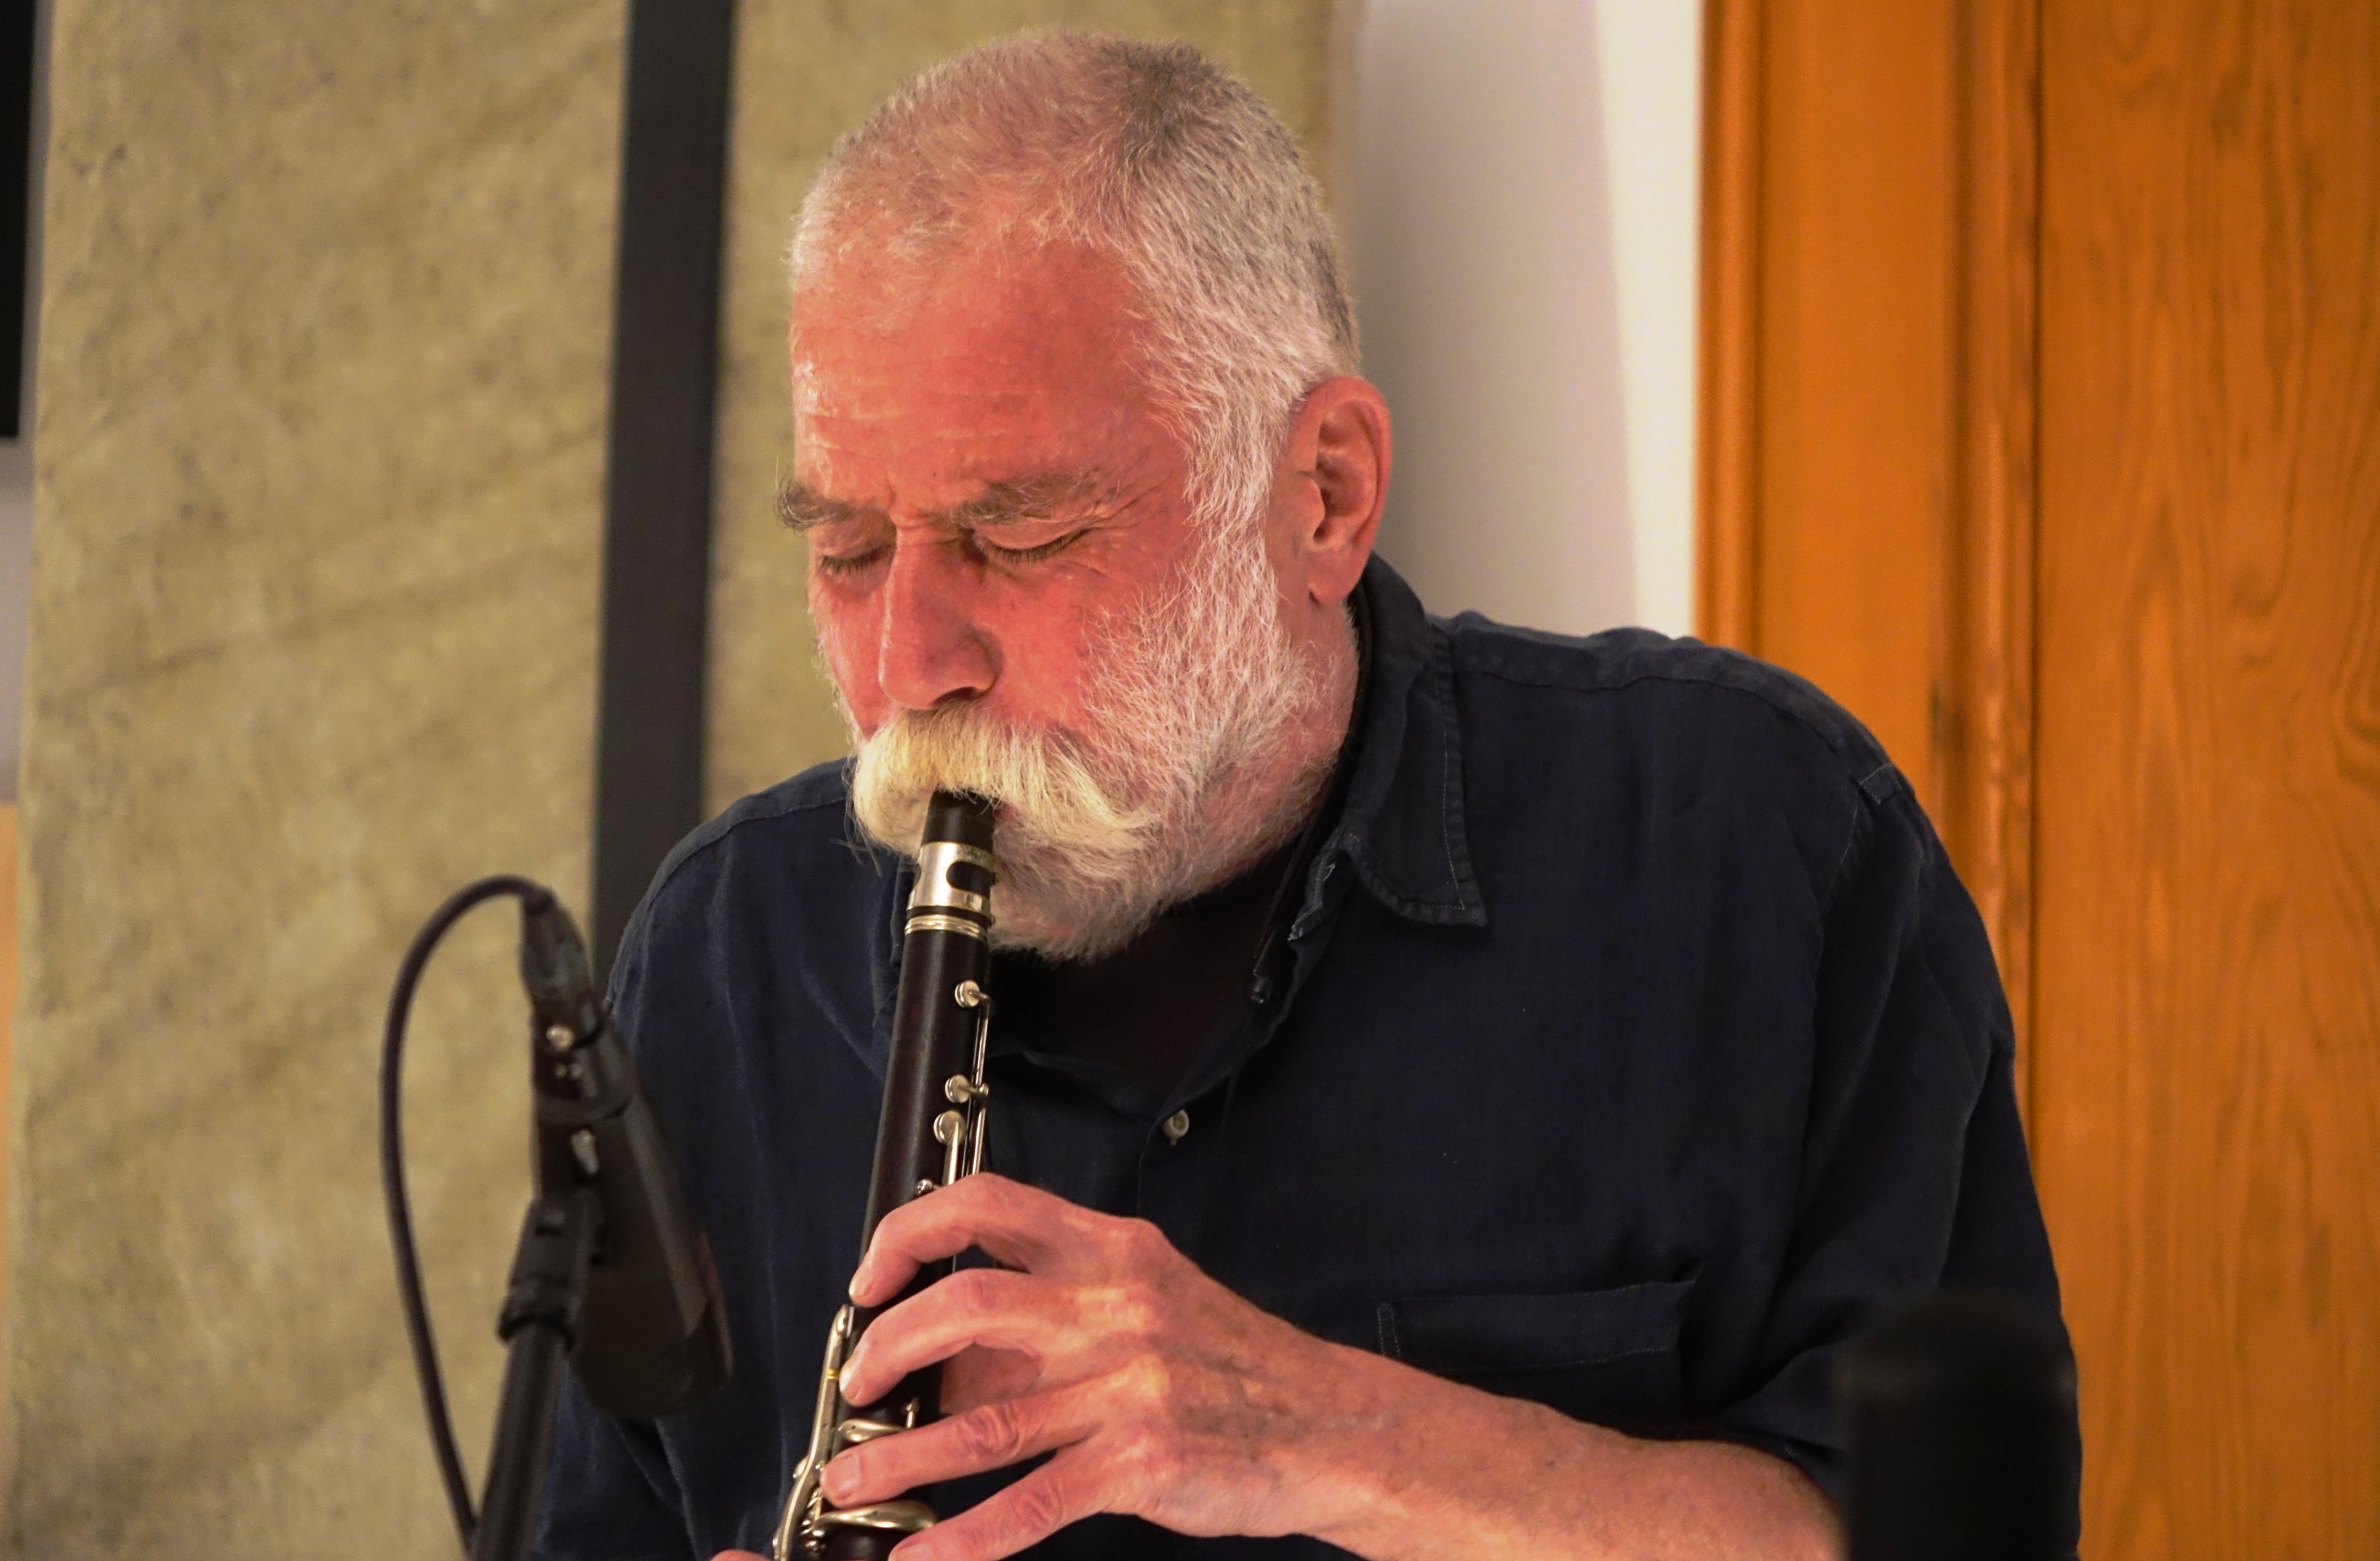 Peter Brötzmann in Wlen, Poland in September 2018